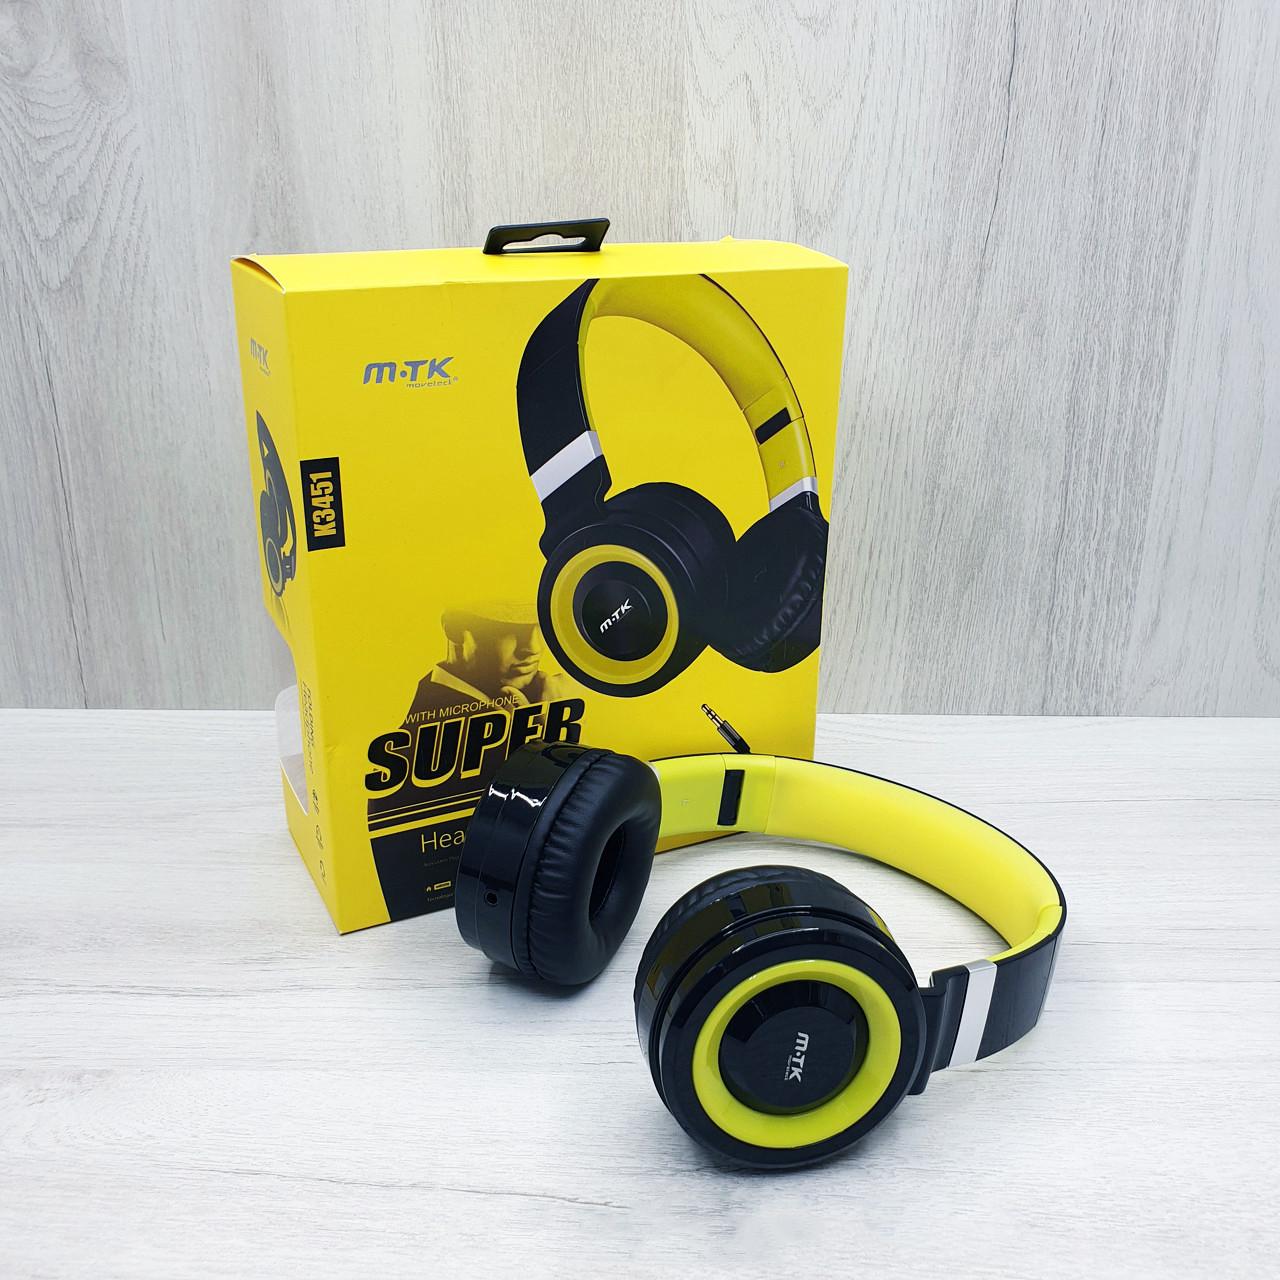 Дротові навушники MTK SUPER BASS K3451 (жовті)